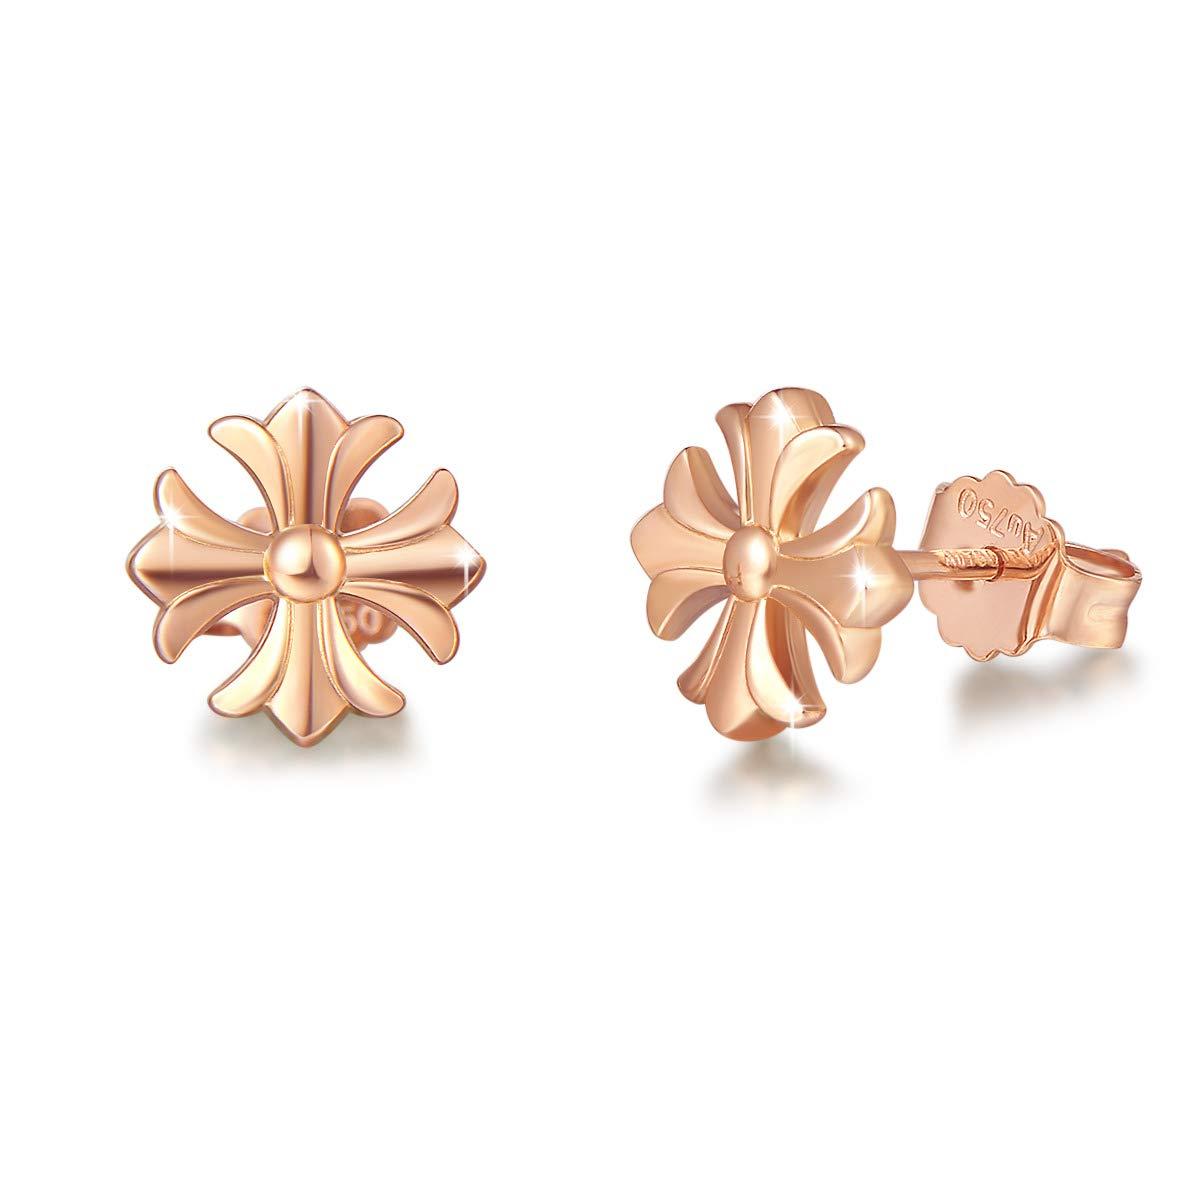 Mother's Day Gift | FANCIME 18K Real Rose Gold Four-leaf Clover/Cross/Geometric Stud Earrings Small Dainty Earrings Fine Jewelry for Women Girls